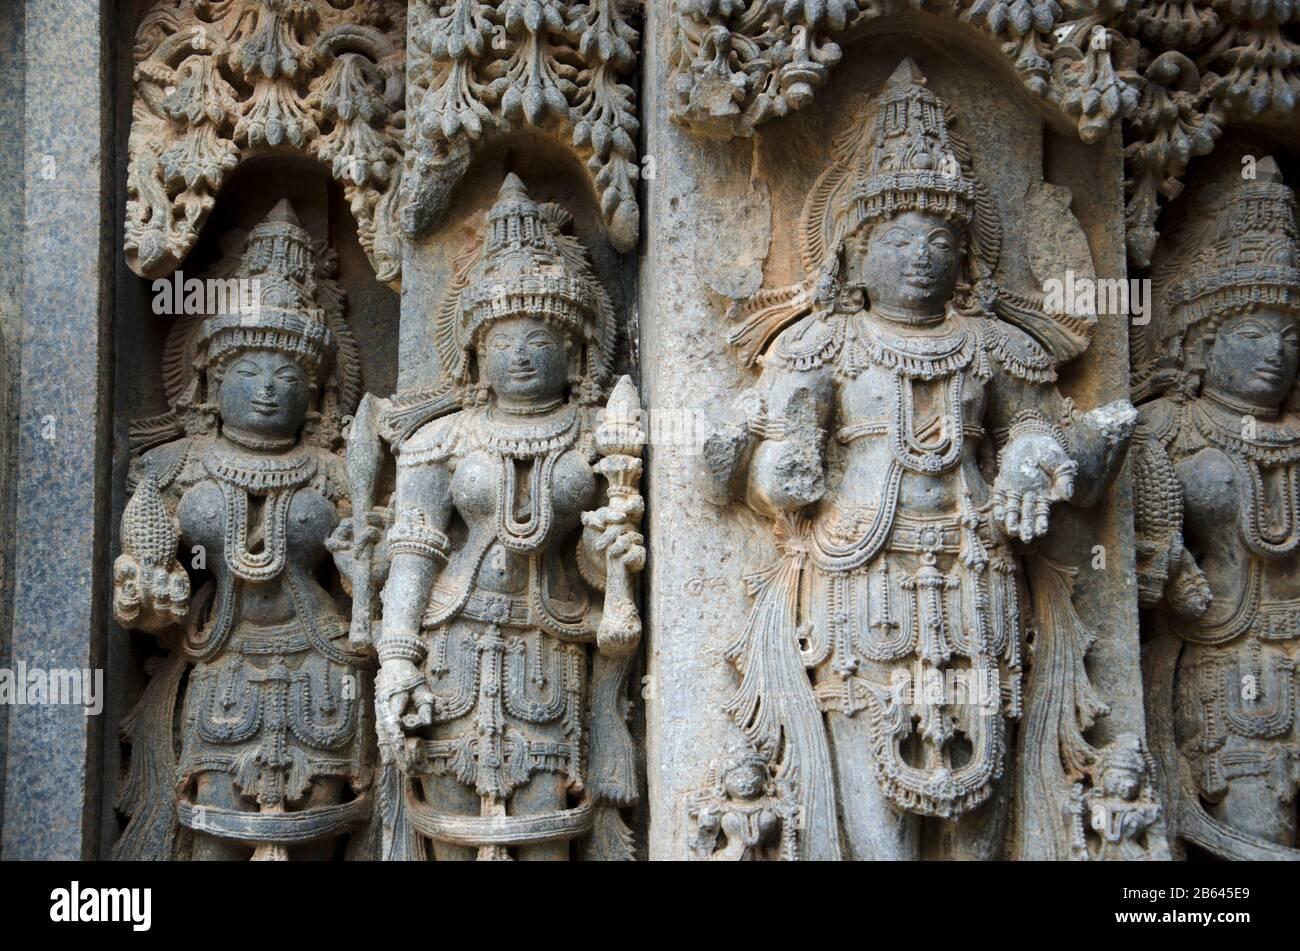 Idoli scolpiti sul Tempio Chennakesava, è un tempio indù Vaishnava, Somanathapura, Karnataka, India Foto Stock